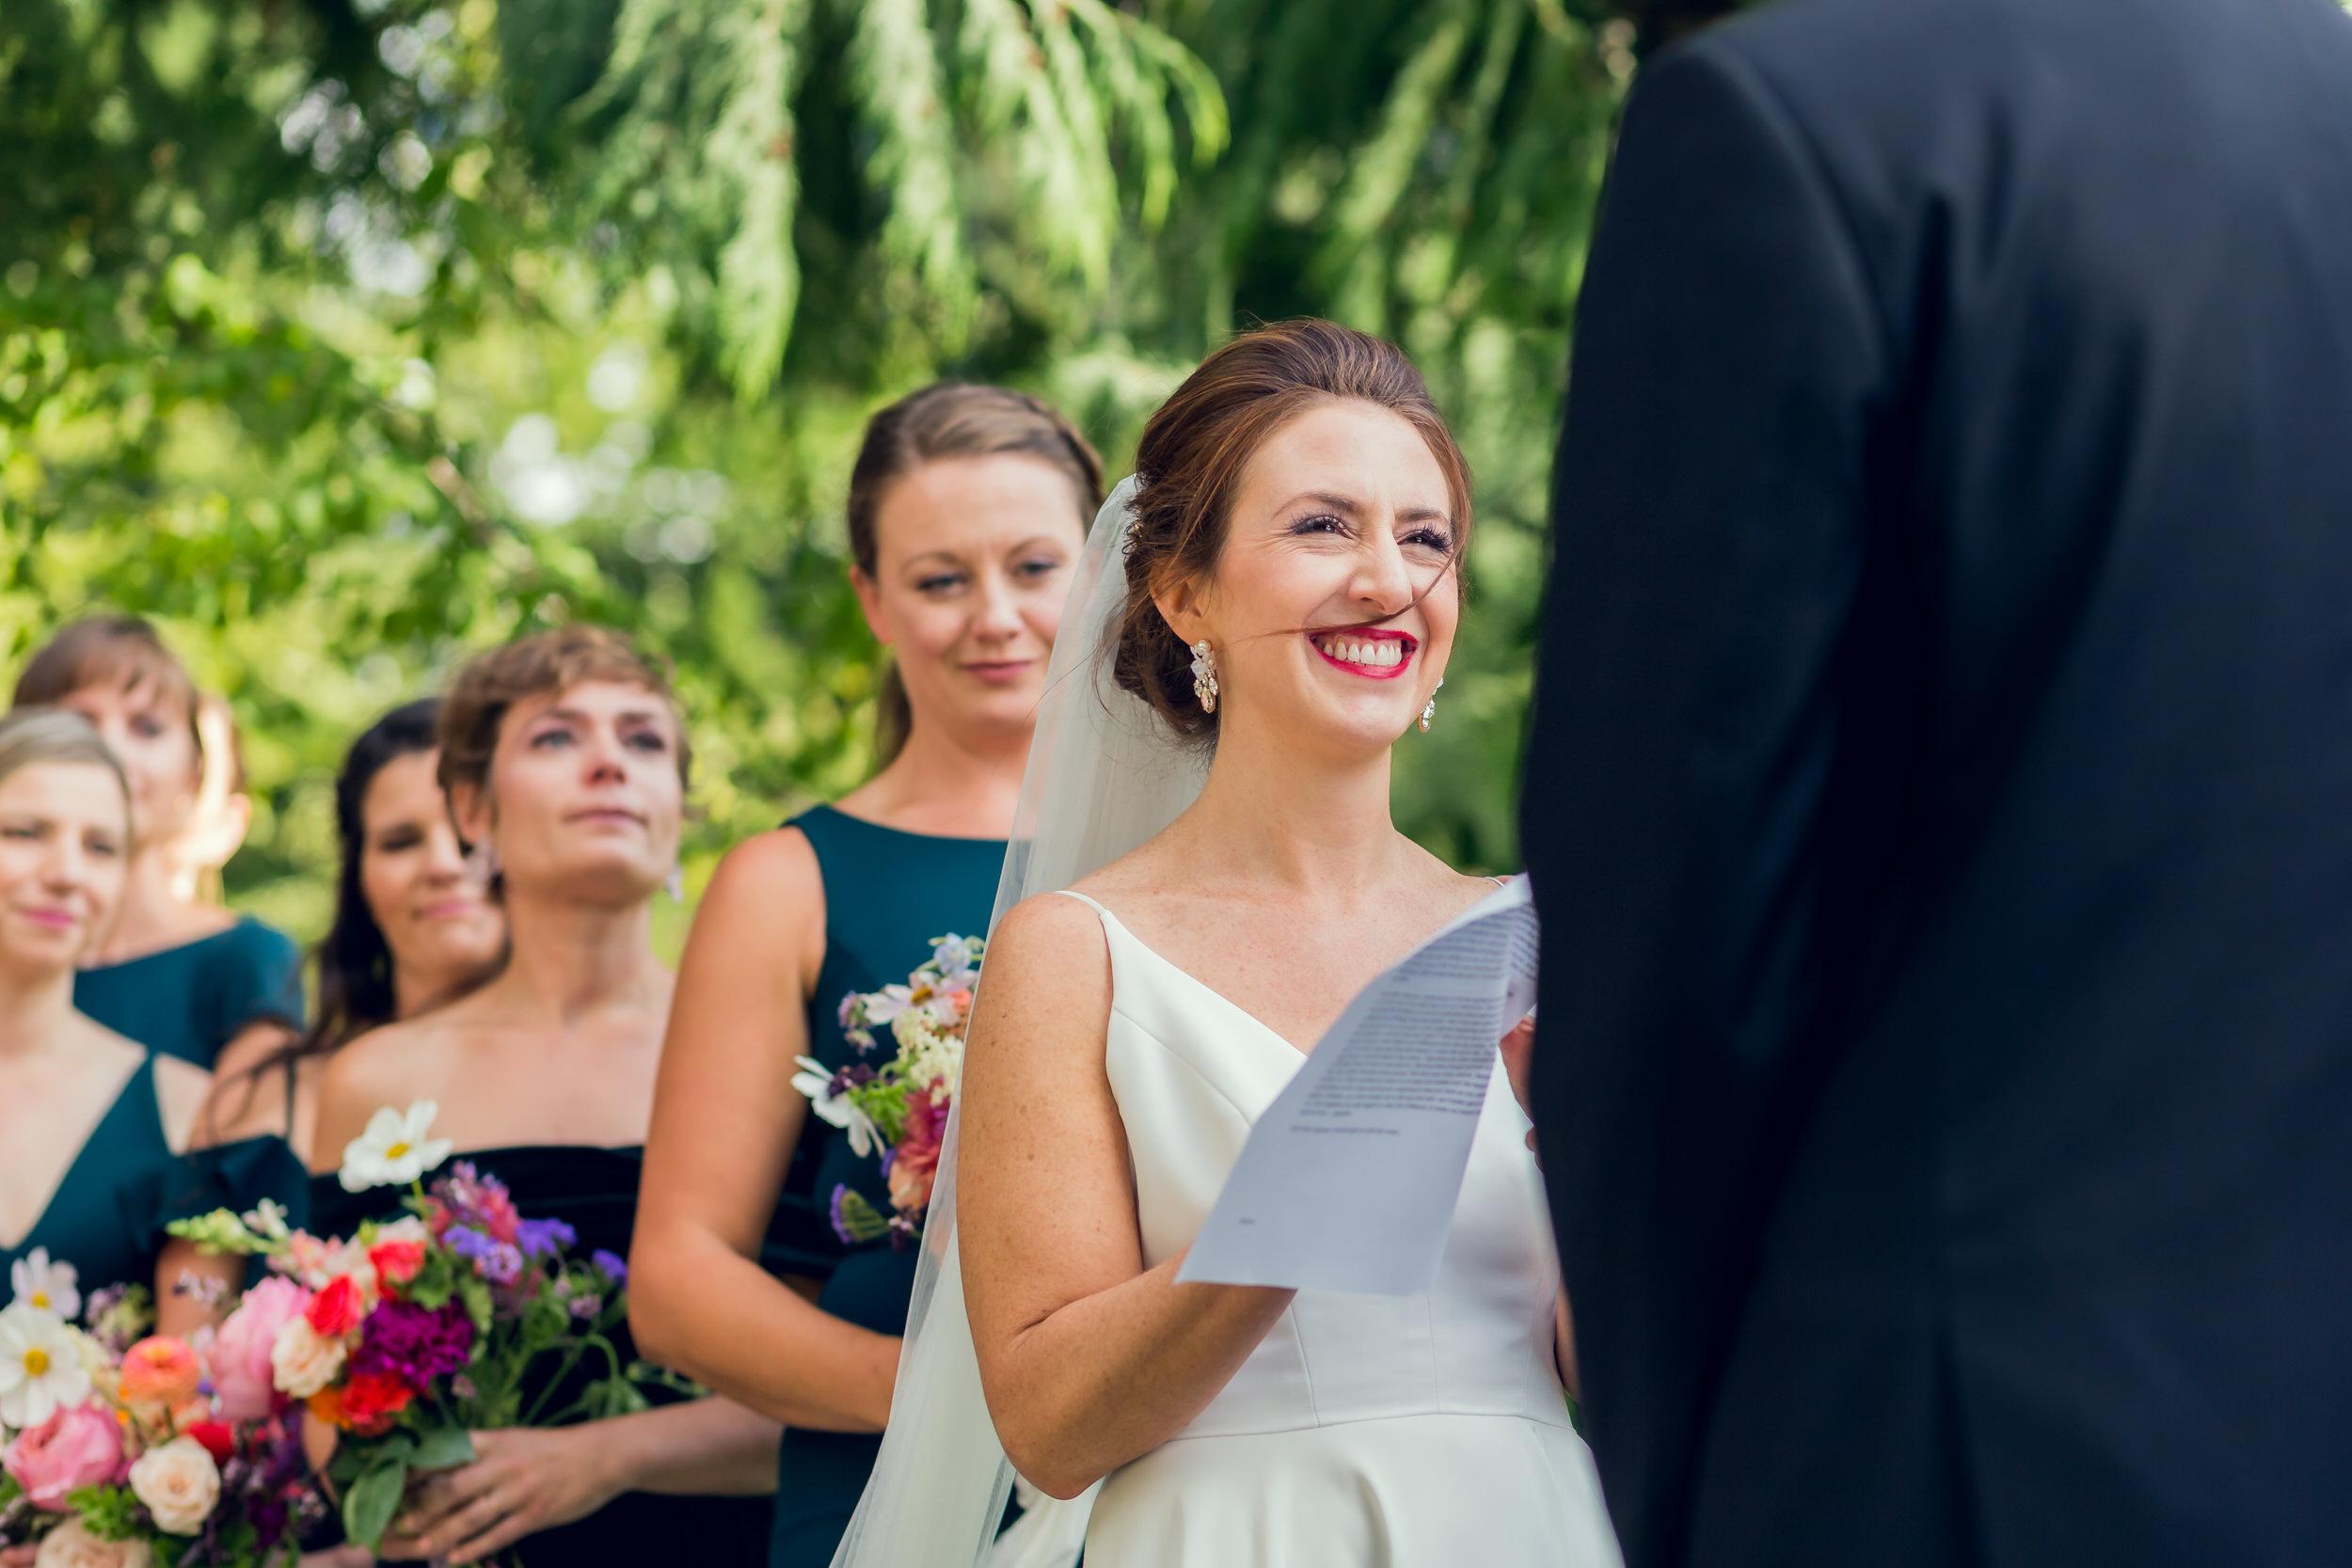 mthoodorganicfarms_wedding_BK026_starkphotography